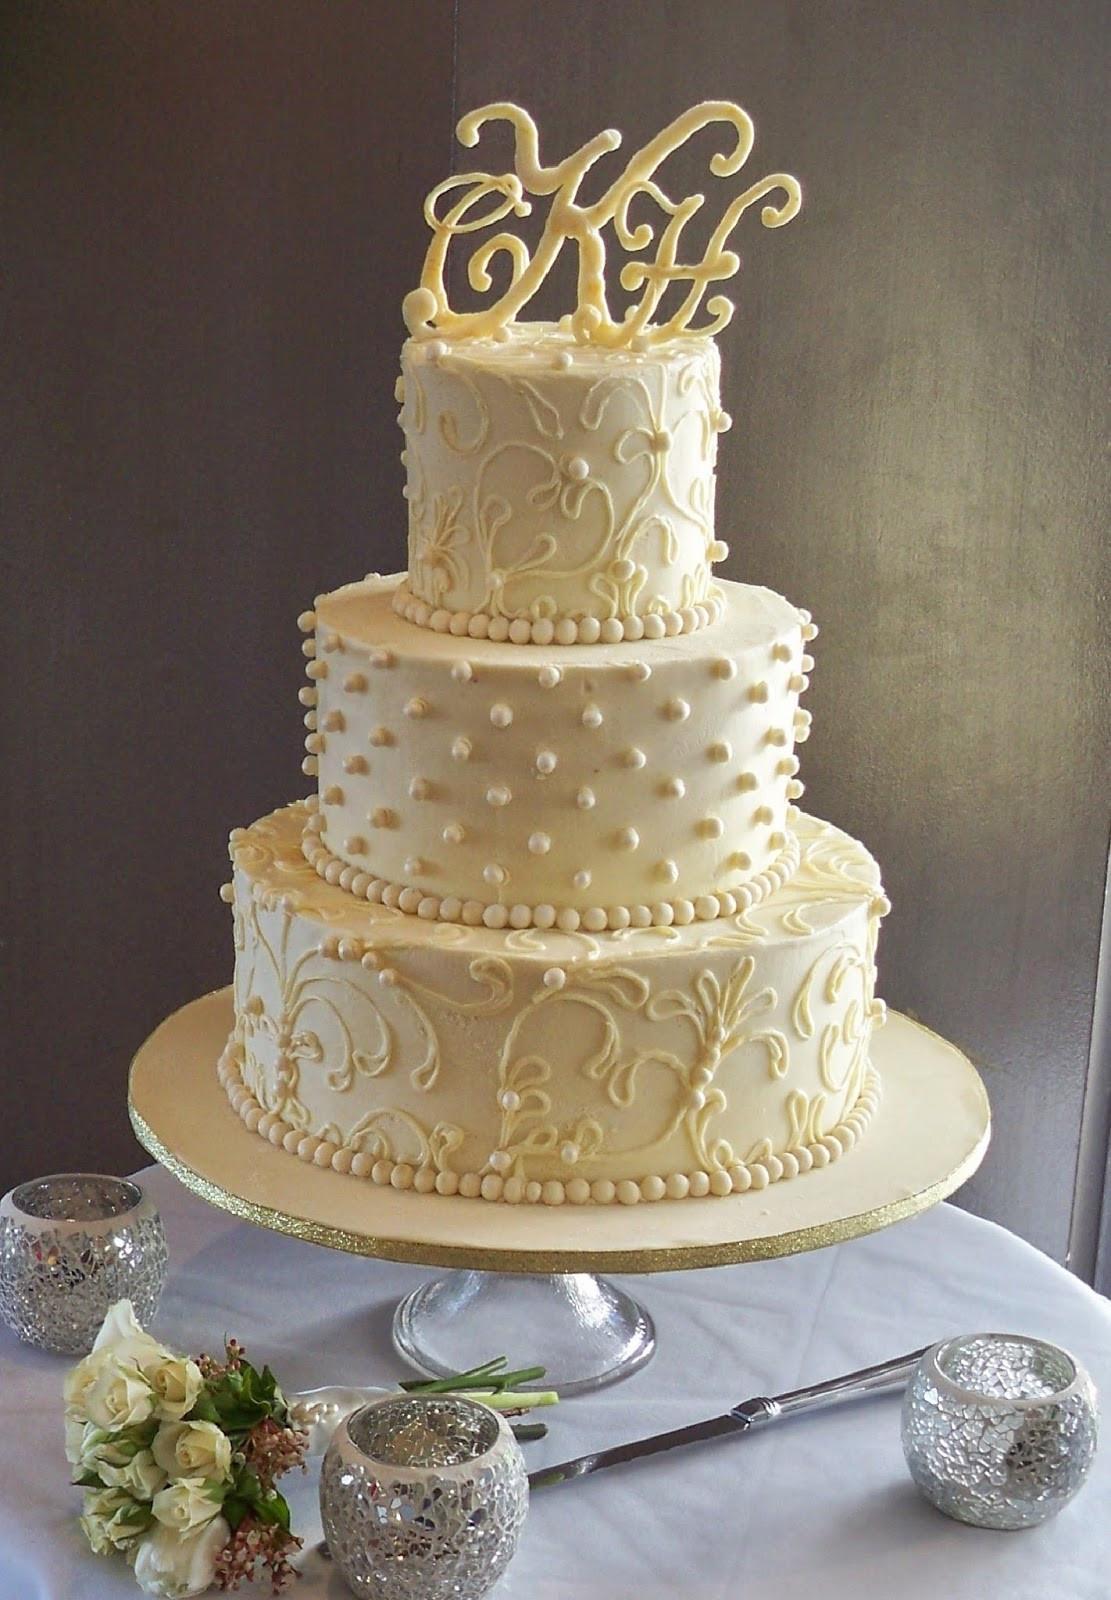 Chocolate Ganache Wedding Cakes  white chocoalte ganache lace wedding cake